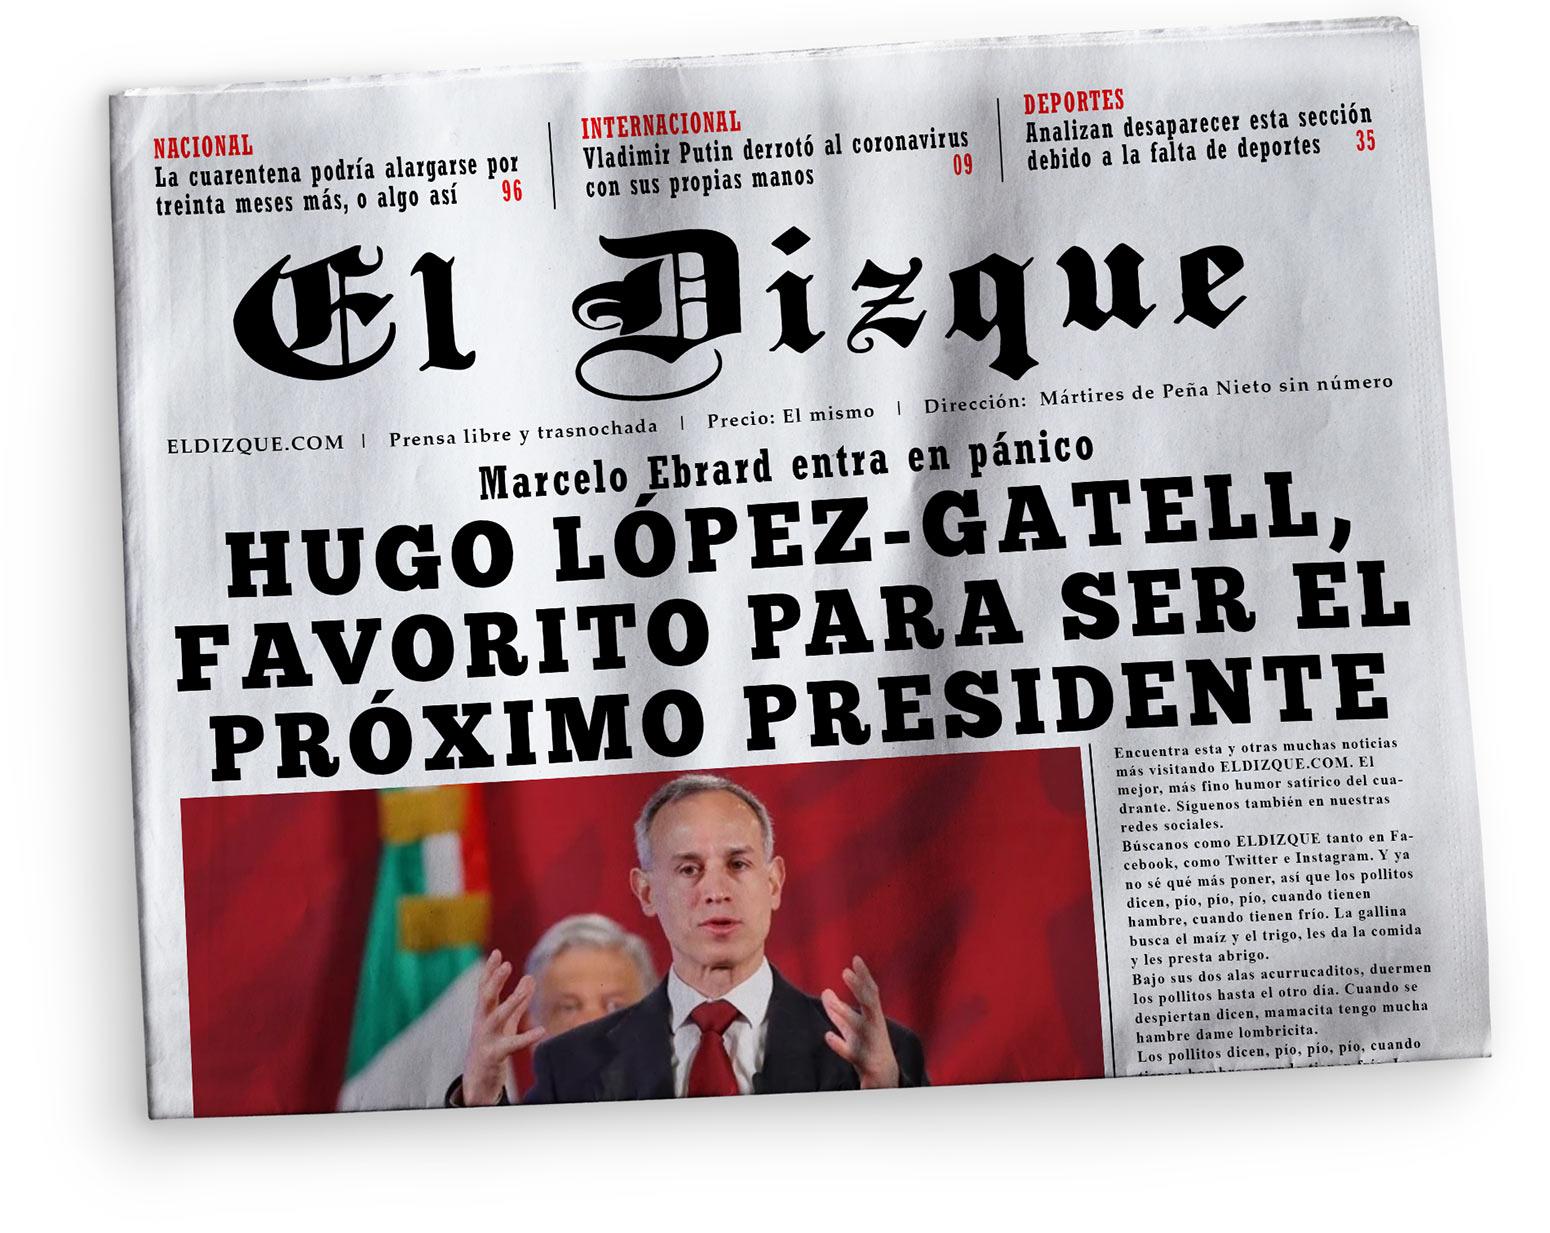 Hugo López-Gatell, favorito para ser el próximo presidente de México